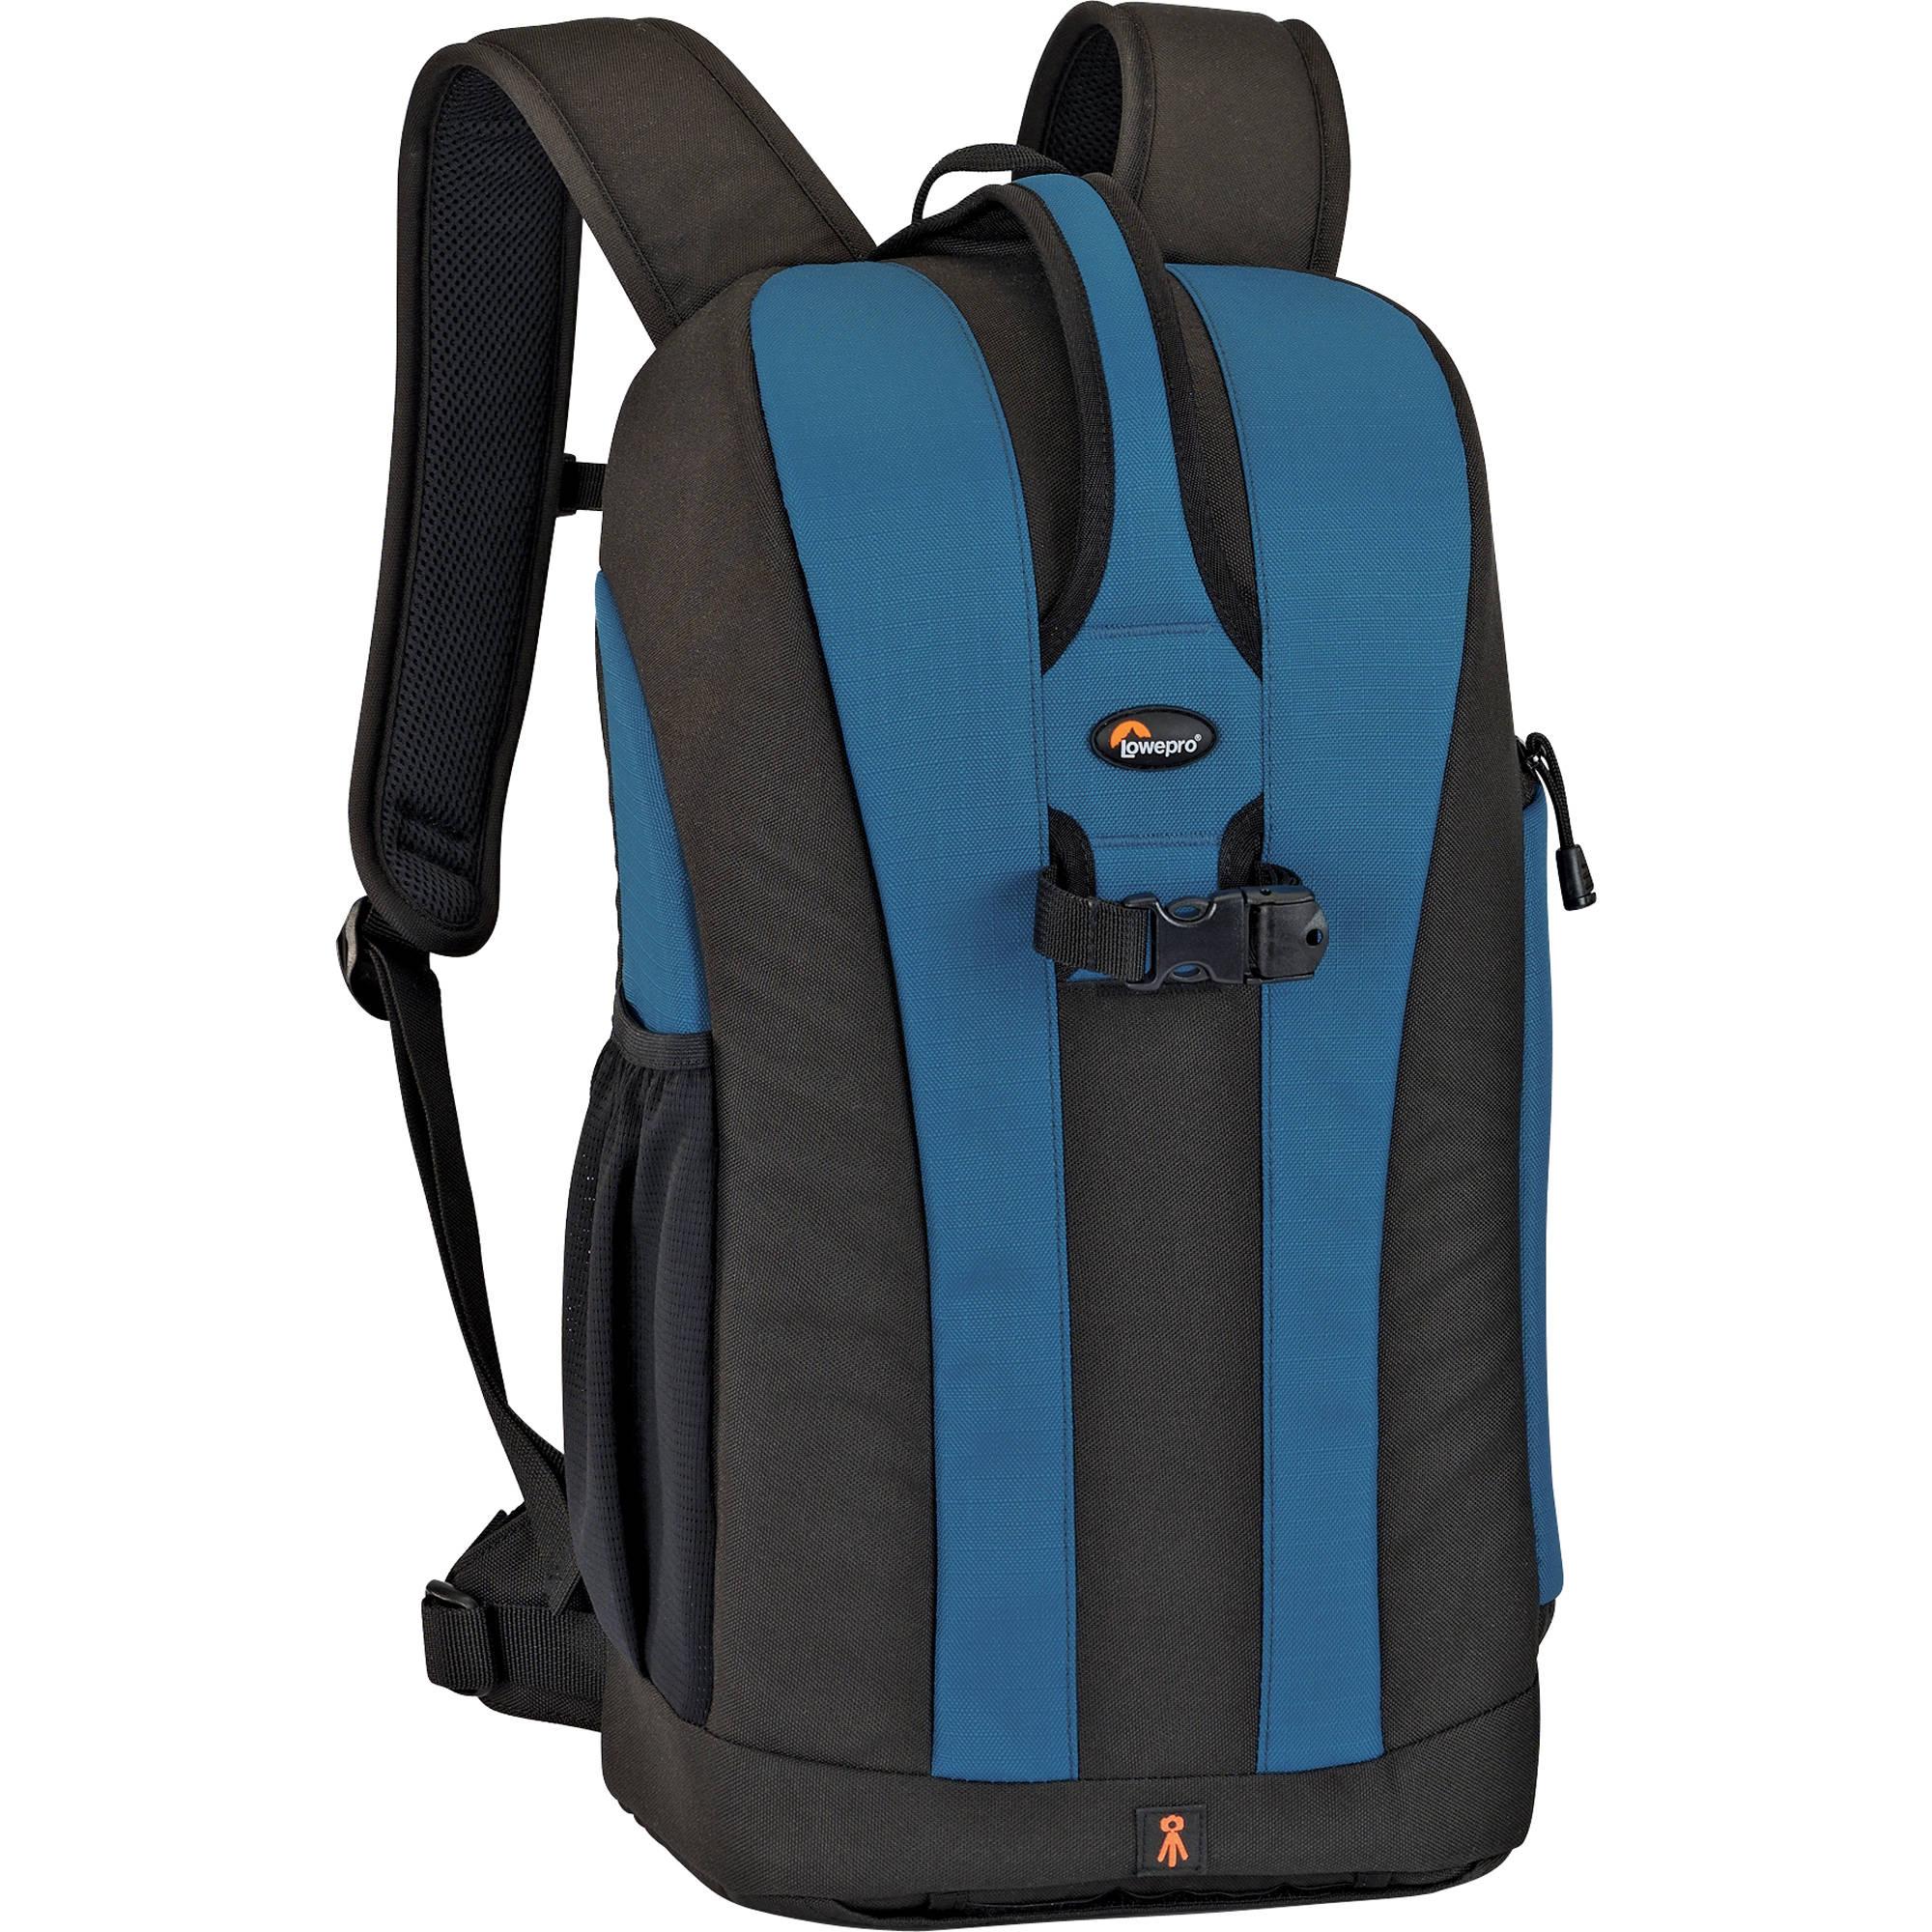 Lowepro Flipside 300 Backpack (Arctic Blue/Black)